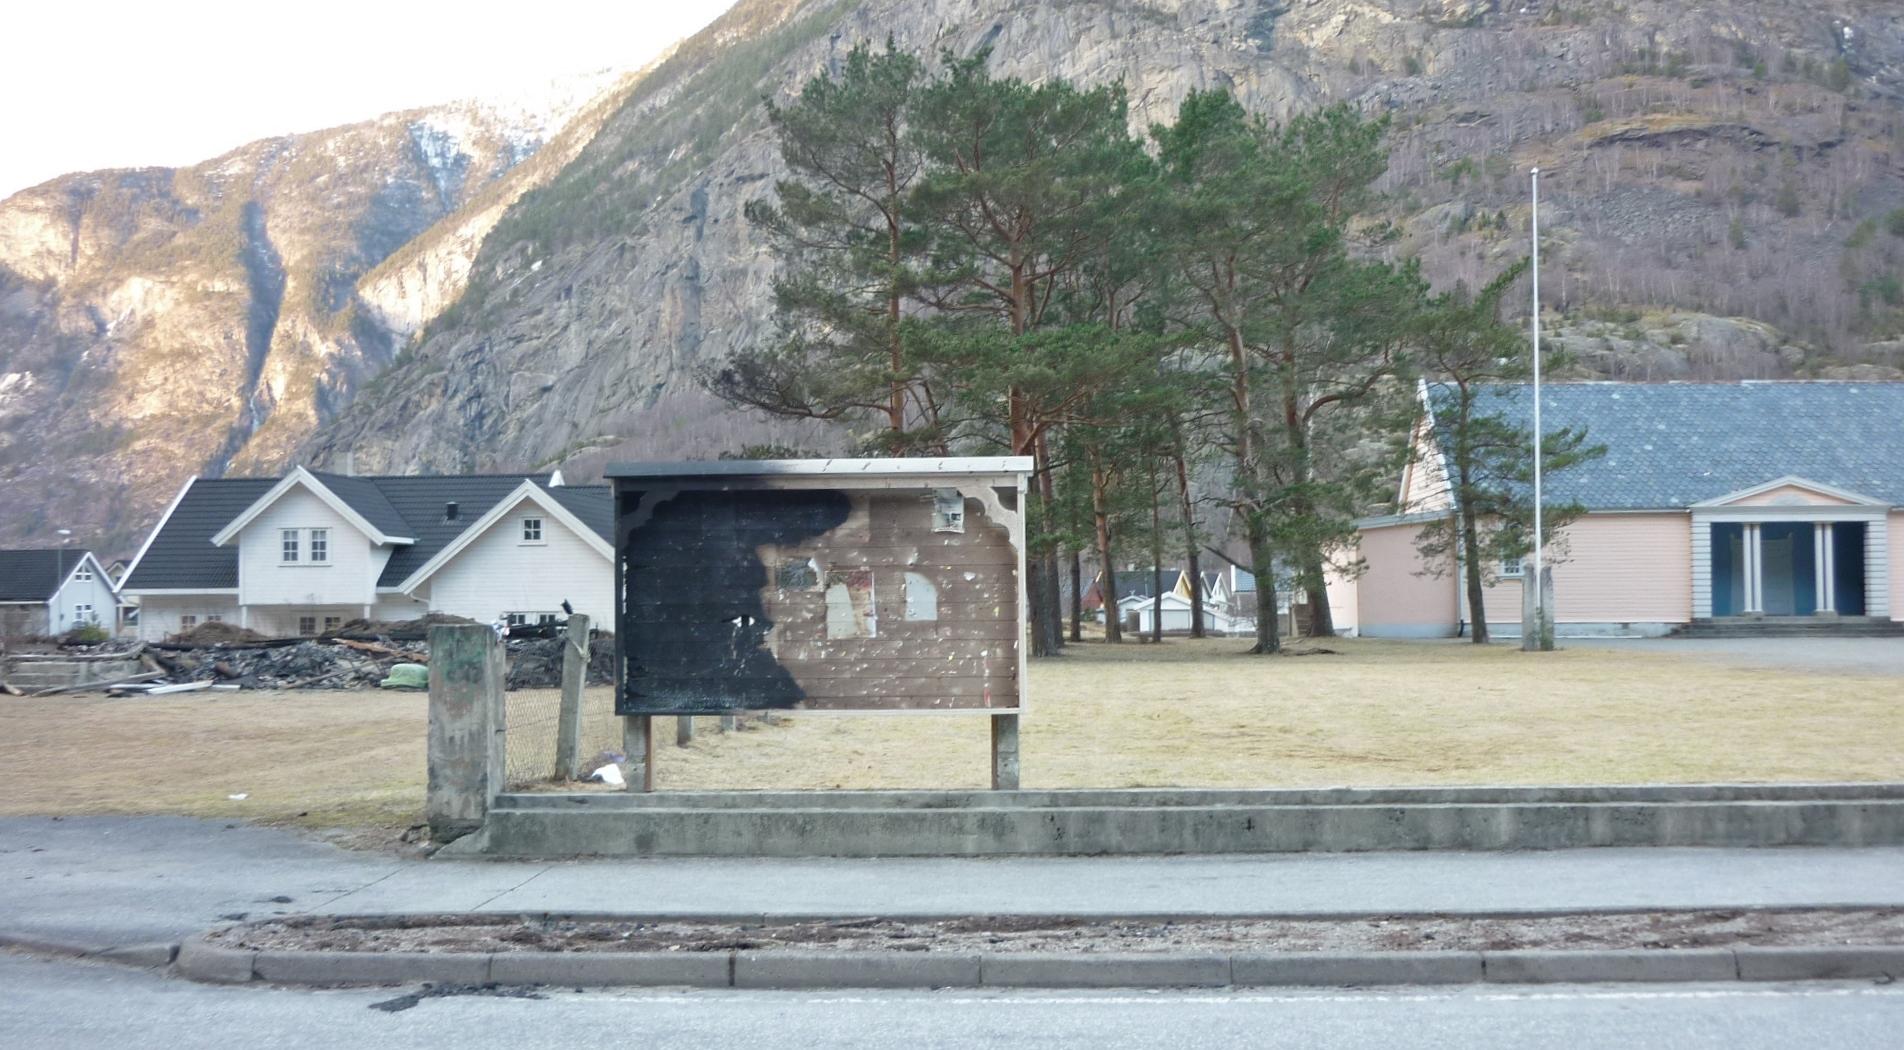 20140128 losjehuset tavle frilund etter brann